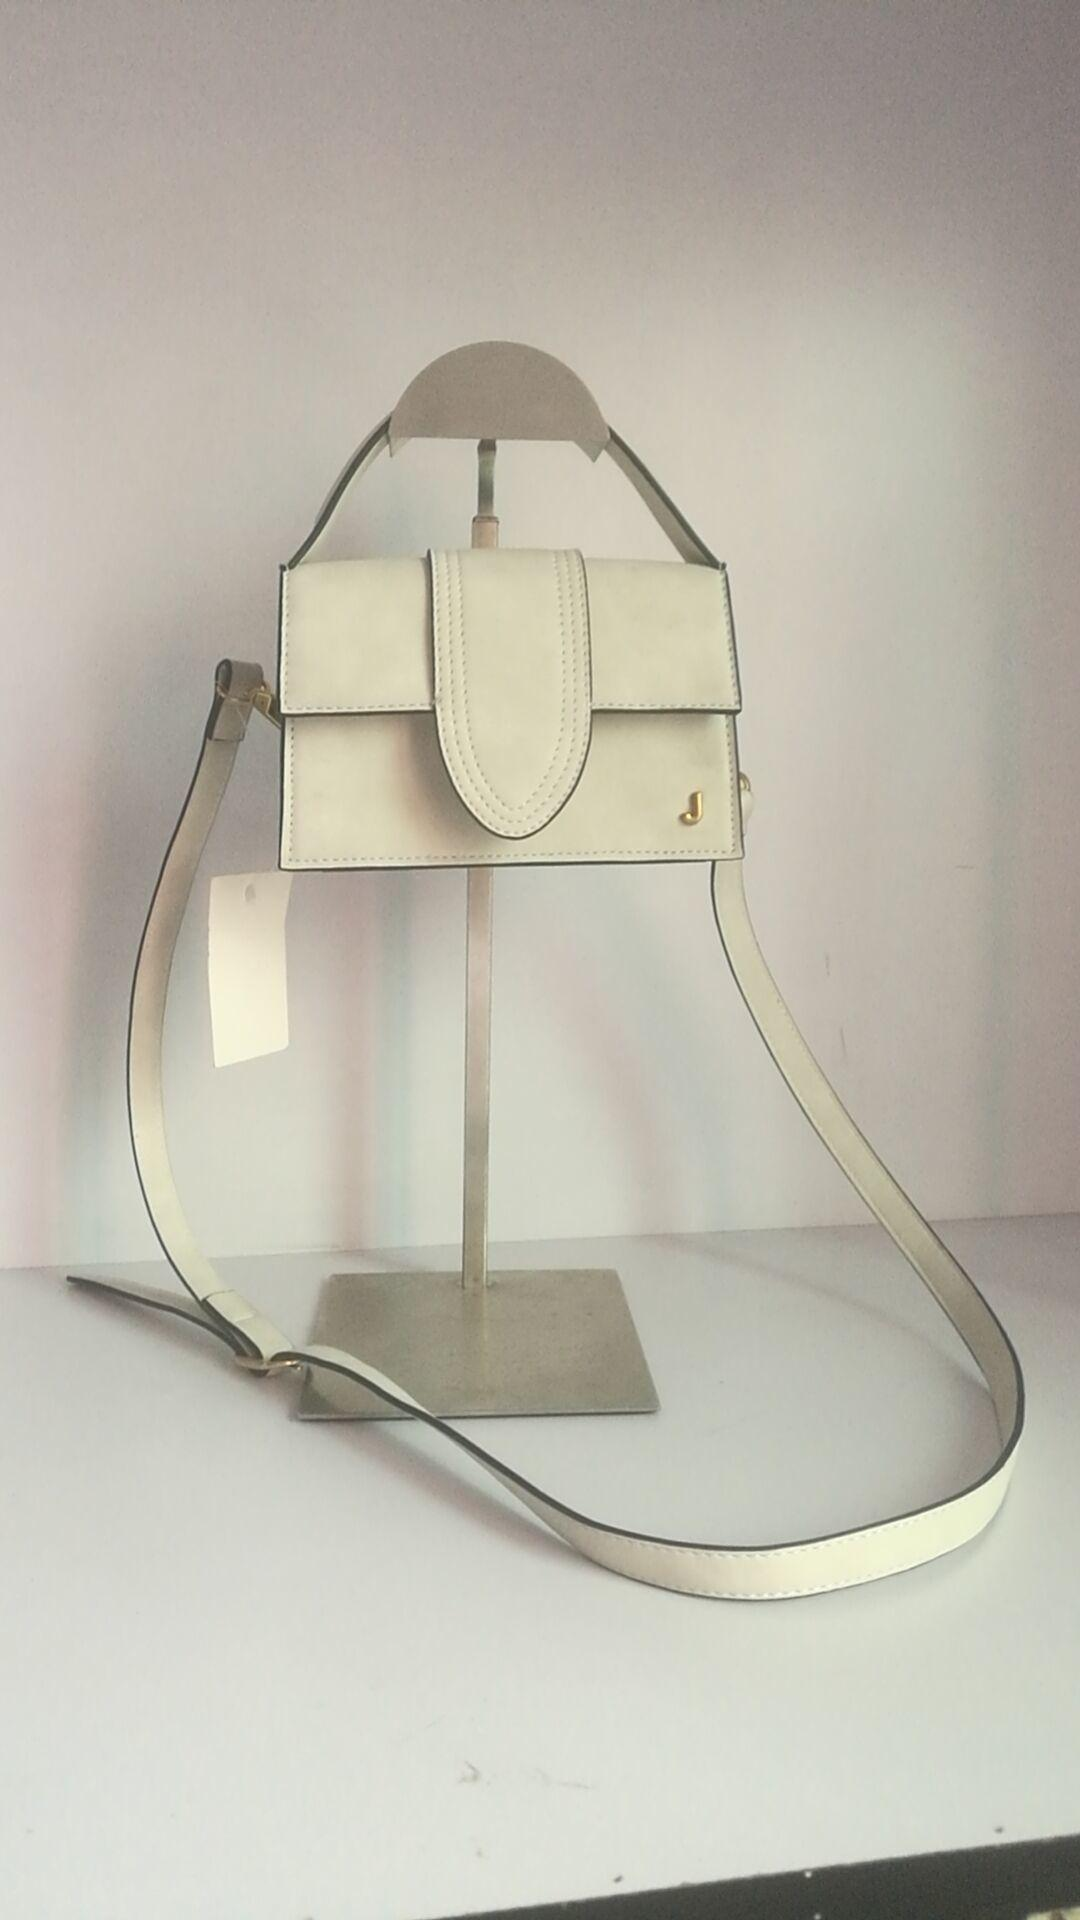 Frosted Texture Handbag Female Trendy Retro Crossbody Mini J Letter Women Nubuck Leather Shoulder Bag Fashion Brand Purses C0220